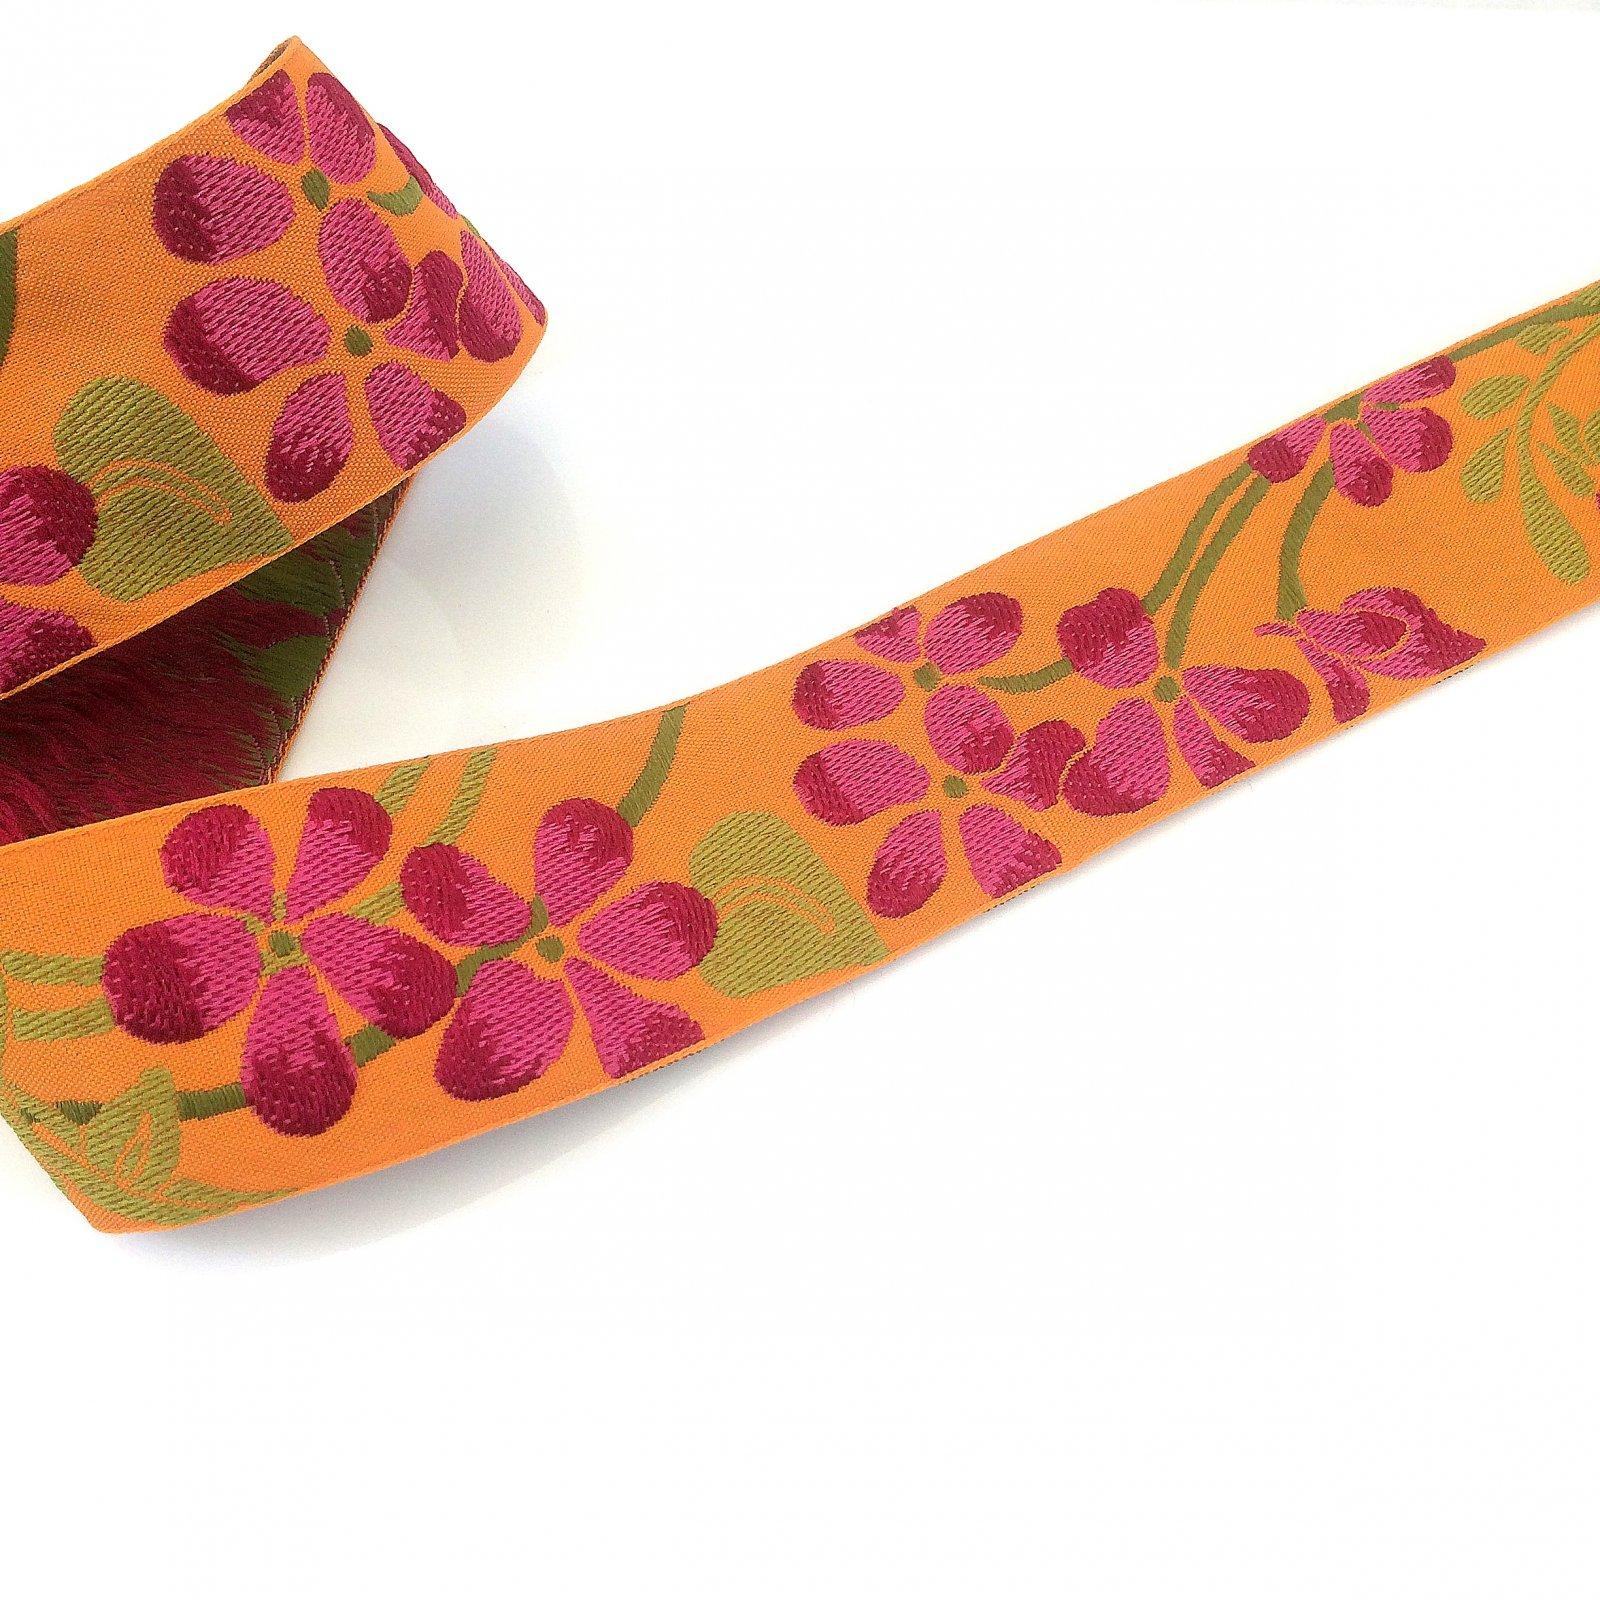 RENAISSANCE RIBBONS - FLOWER - FUSCHIA ON ORANGE